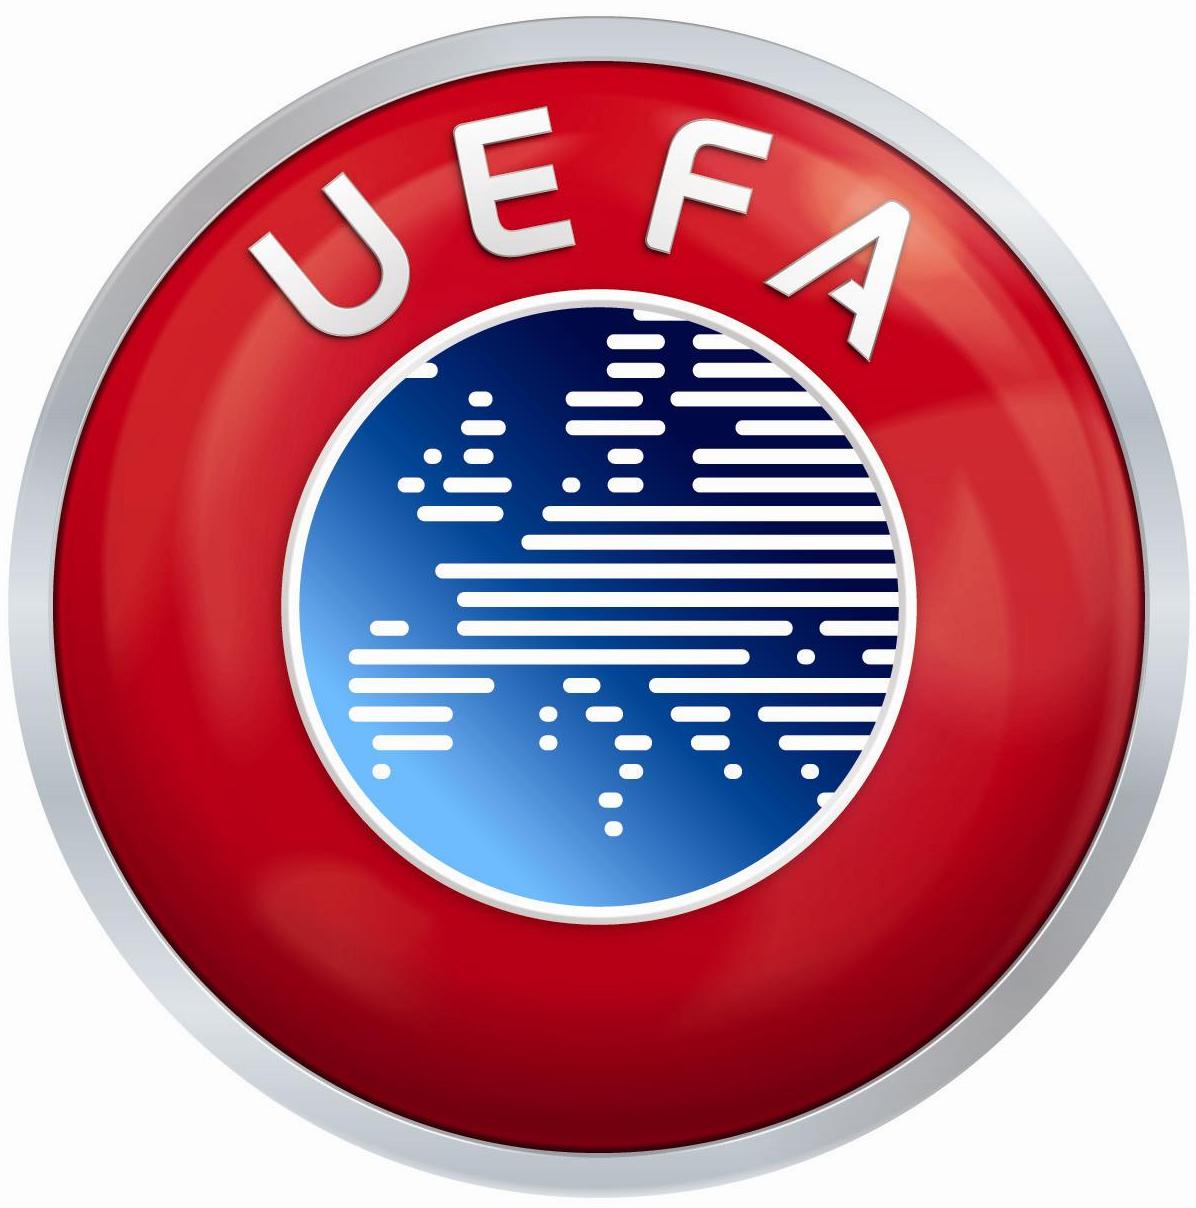 JOTW: Central Services Coordinator at UEFA - Sports Venue ...